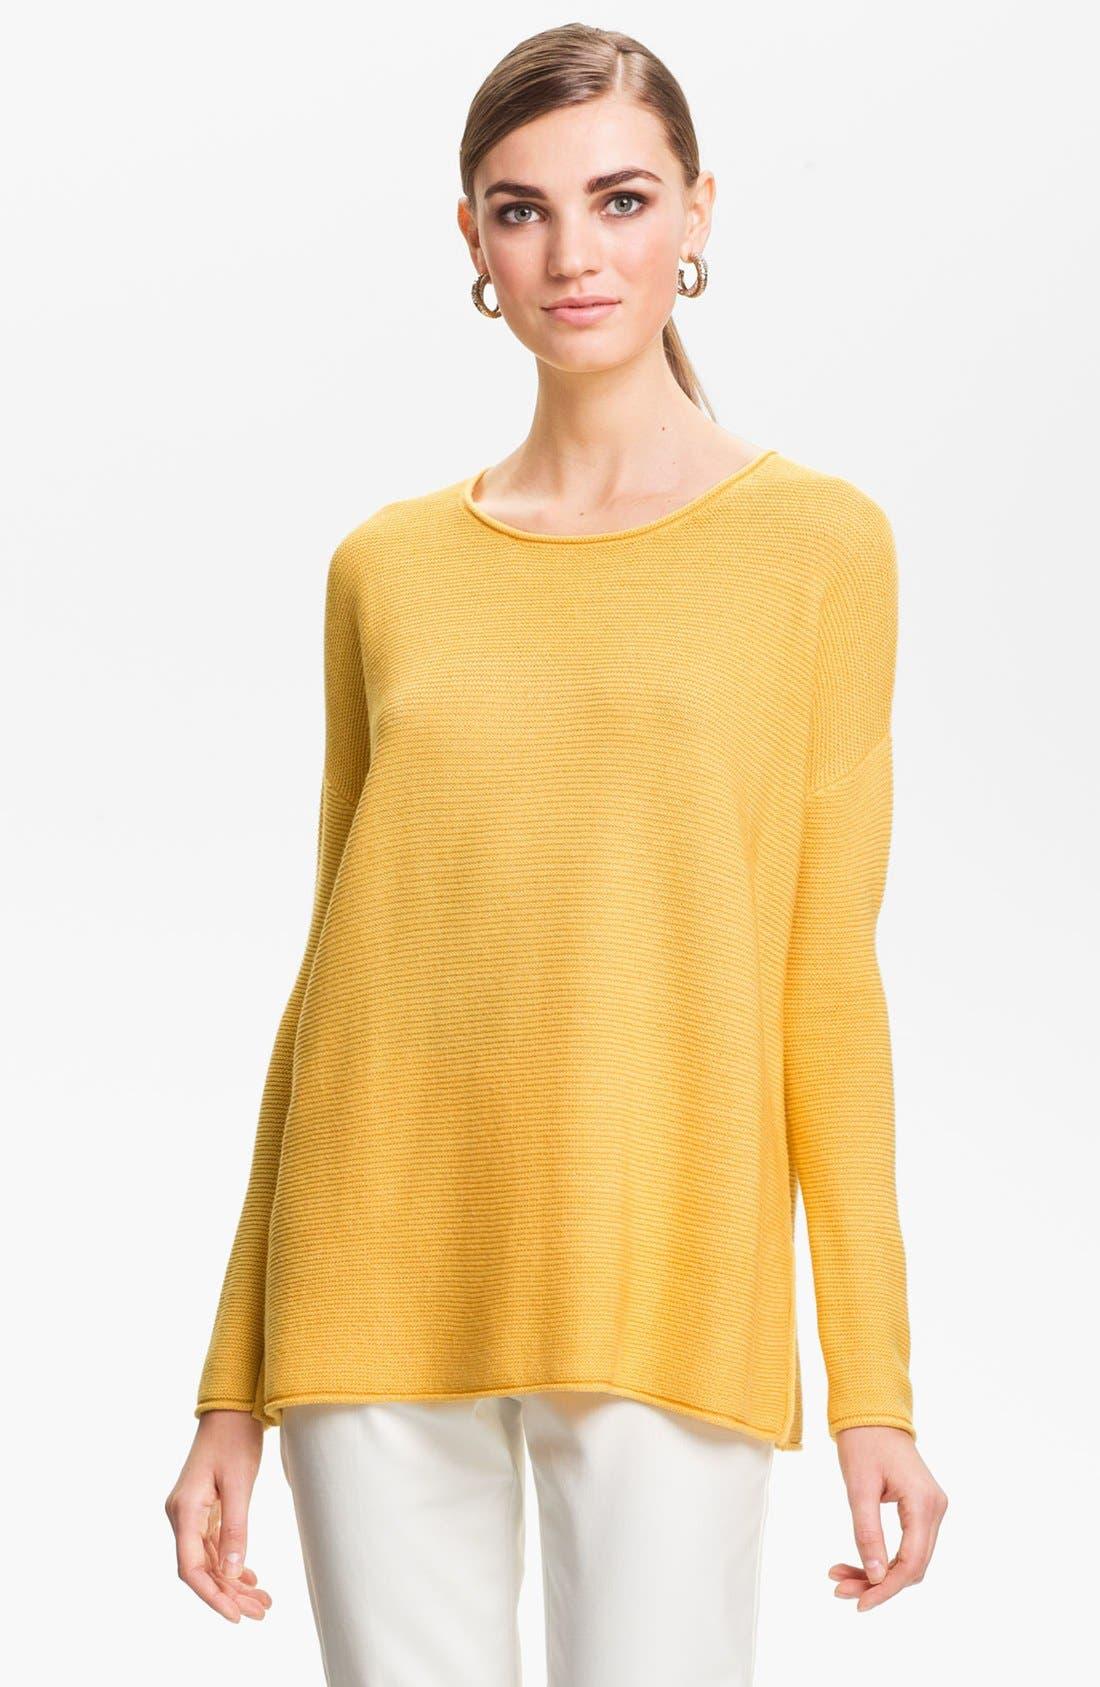 Alternate Image 1 Selected - St. John Yellow Label Ottoman Knit Sweater